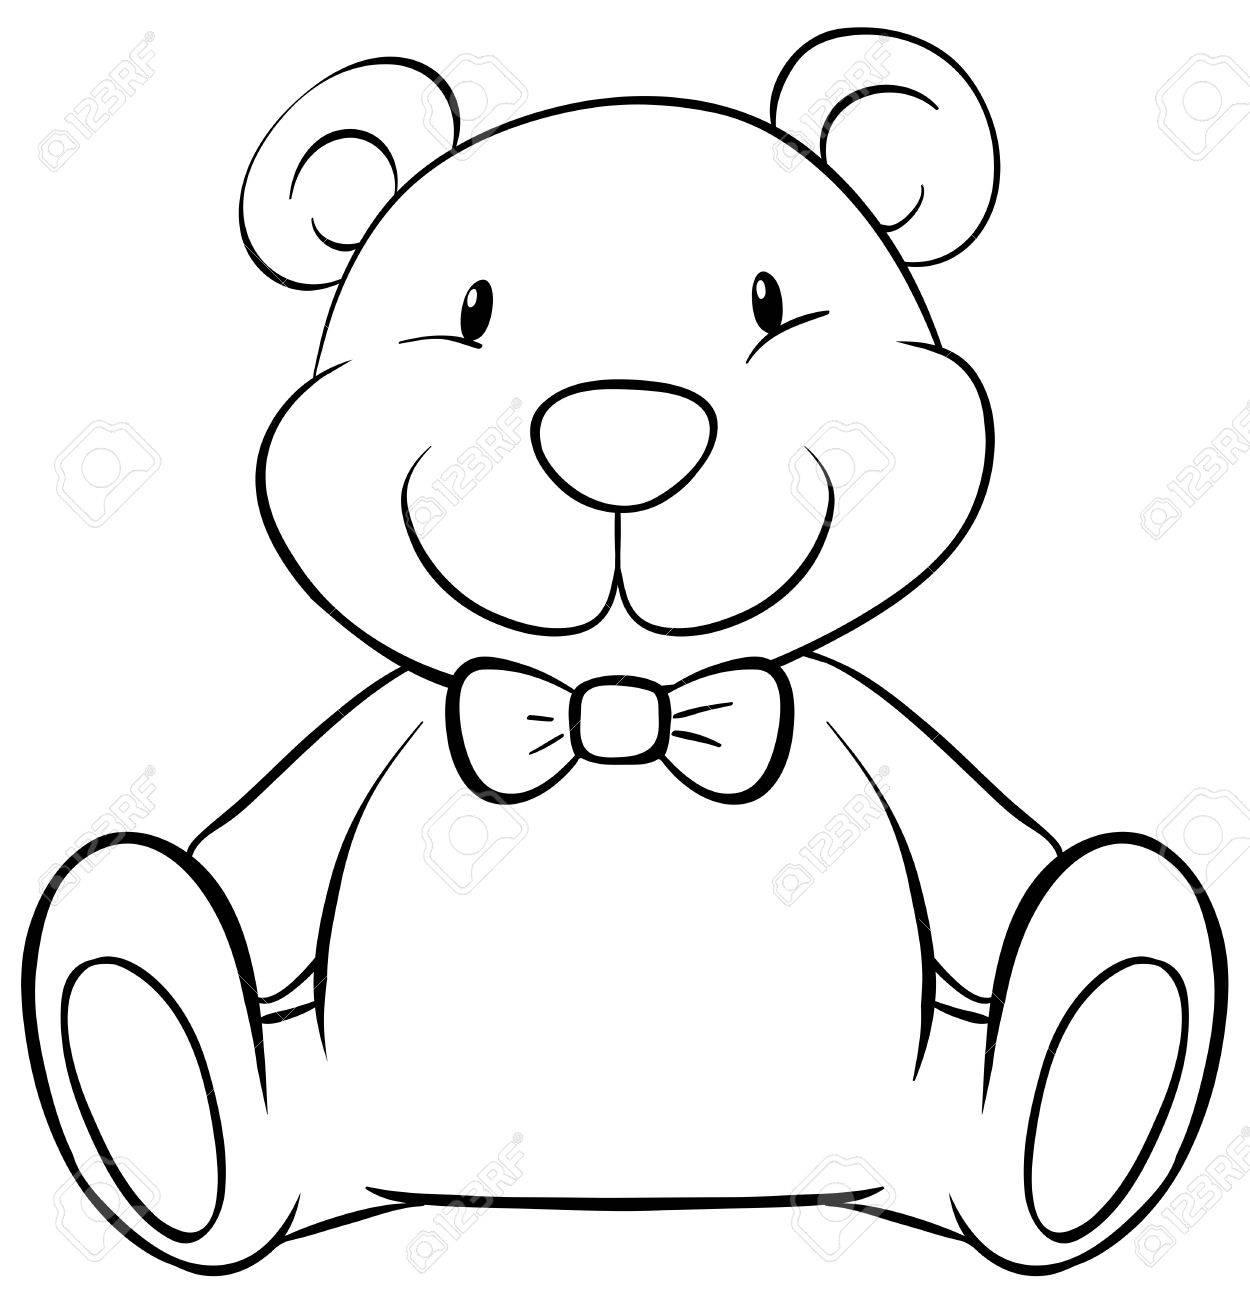 close up cute teddy bear royalty free cliparts vectors and stock rh 123rf com